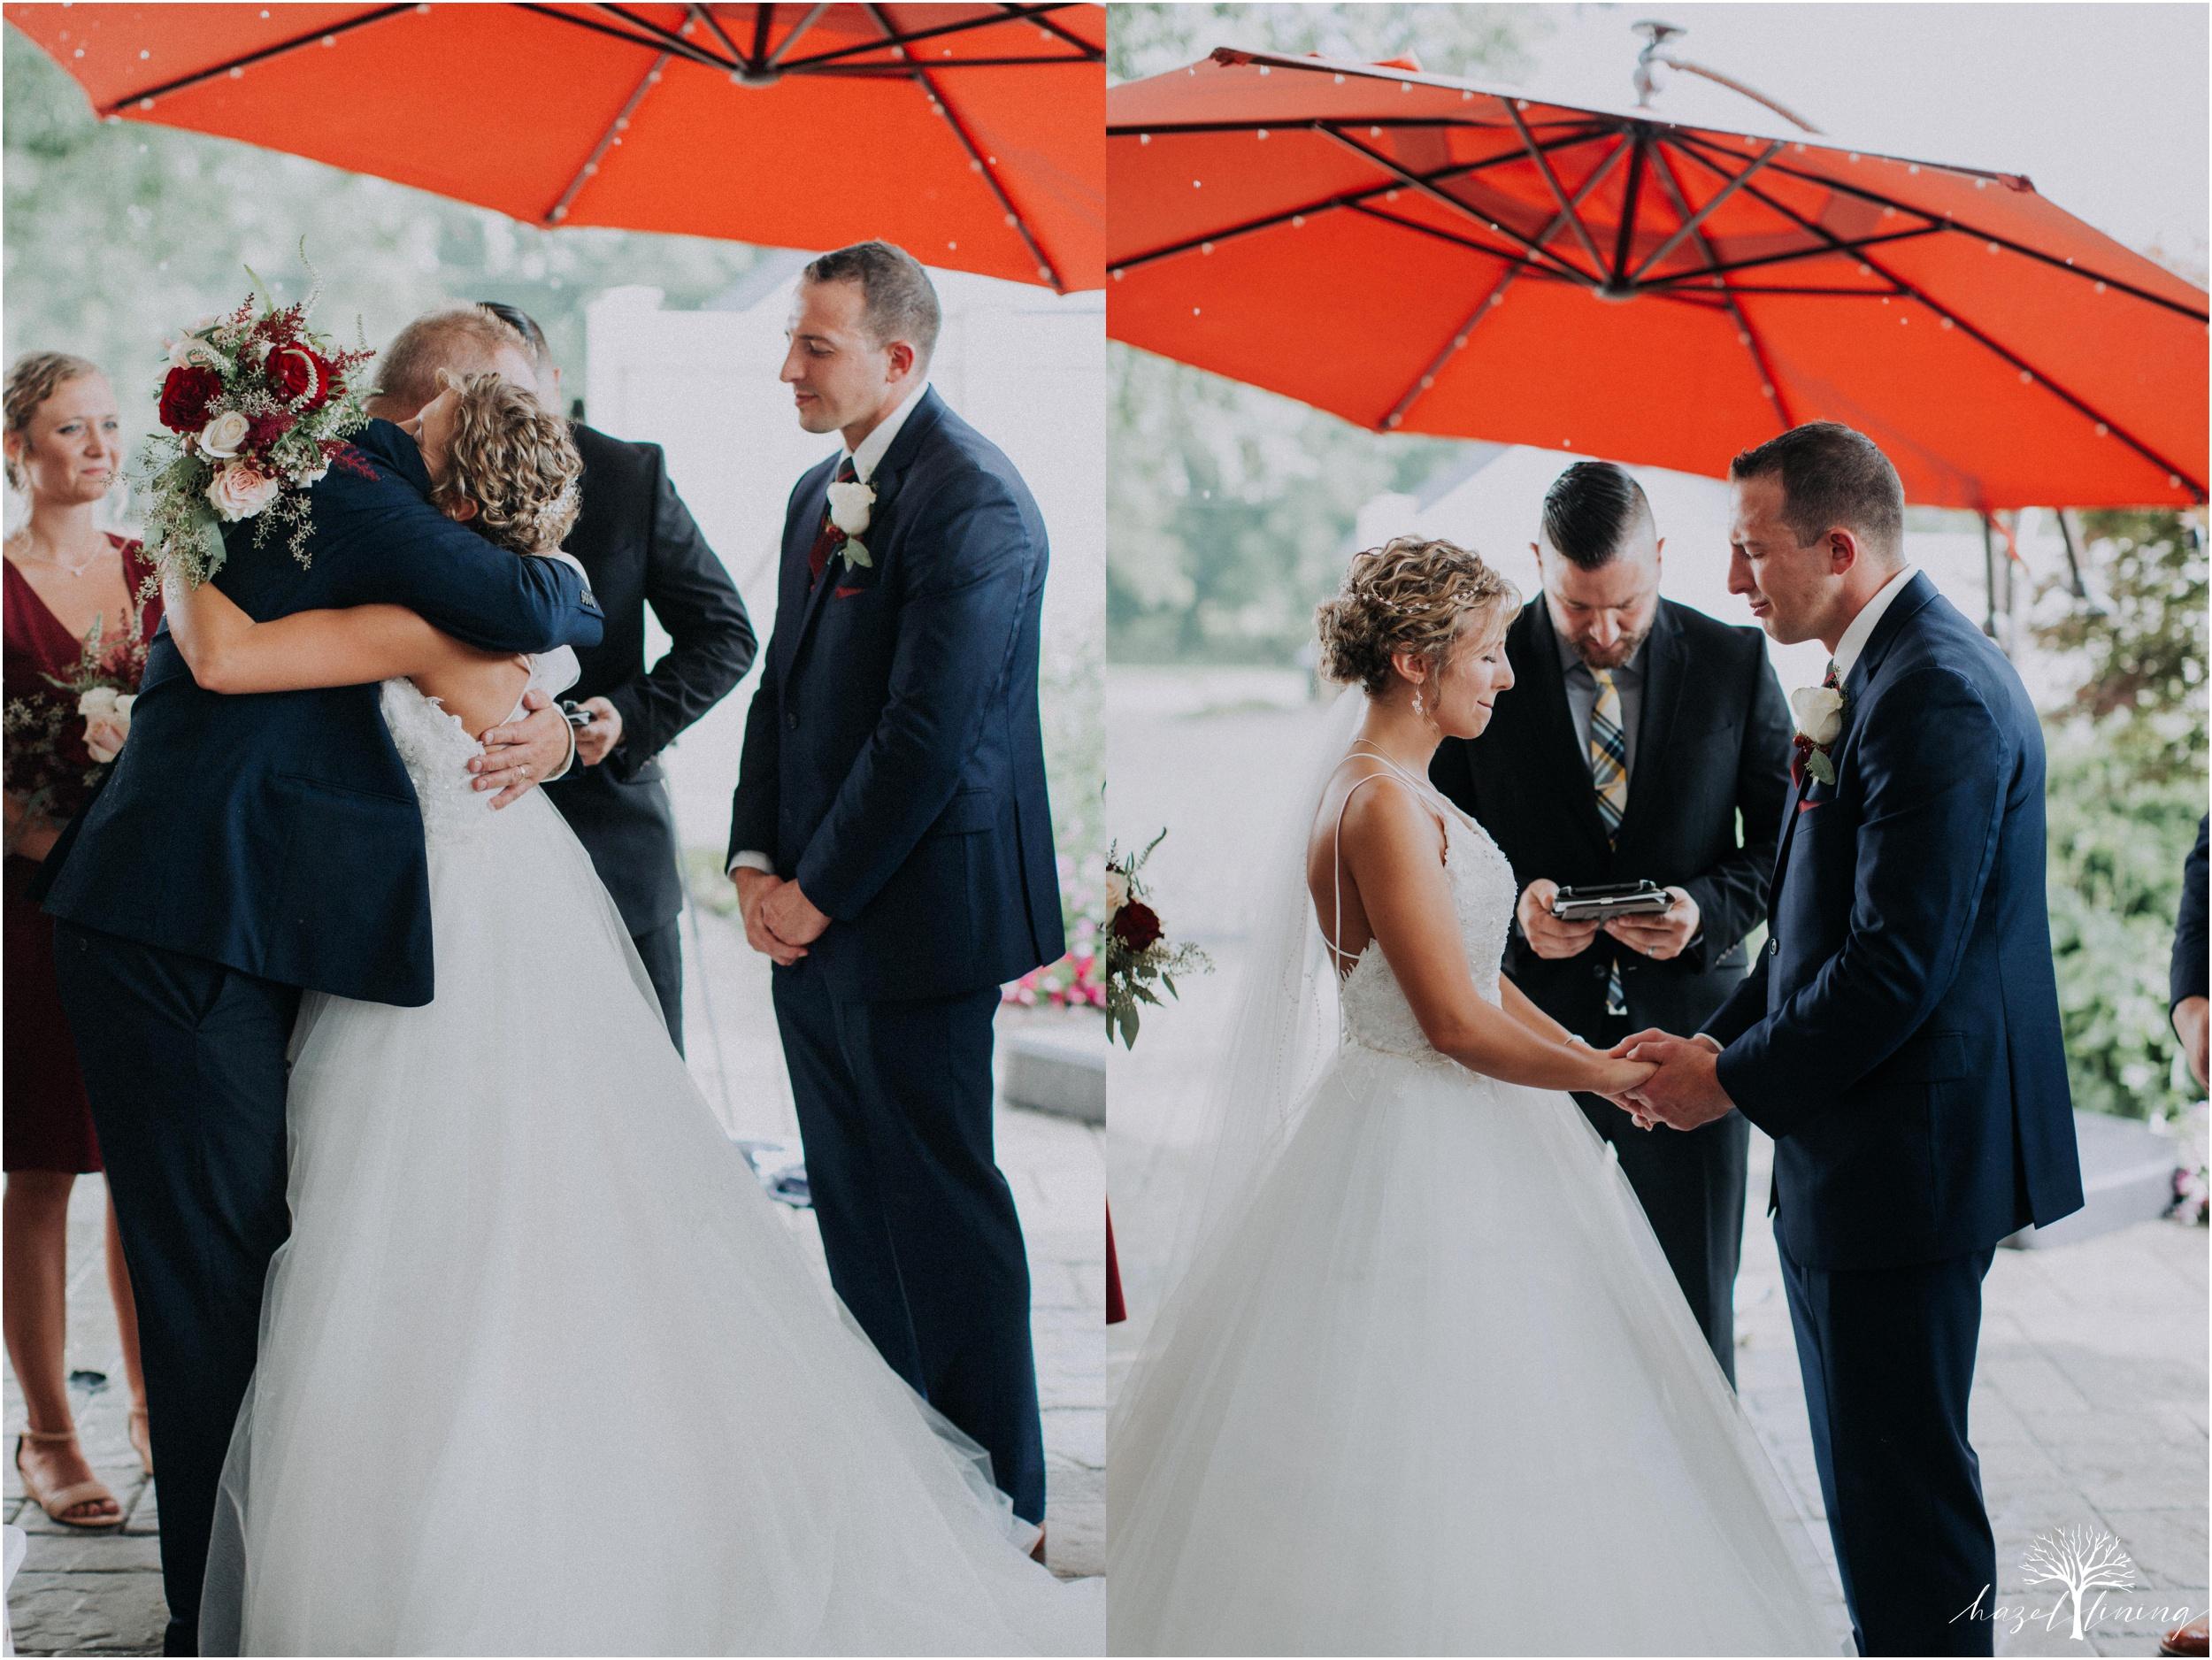 jonathan-weibel-becky-haywood-loft-at-sweetwater-cc-pennsburg-pennsylvania-rainy-day-summer-wedding-hazel-lining-travel-wedding-elopement-photography_0043.jpg